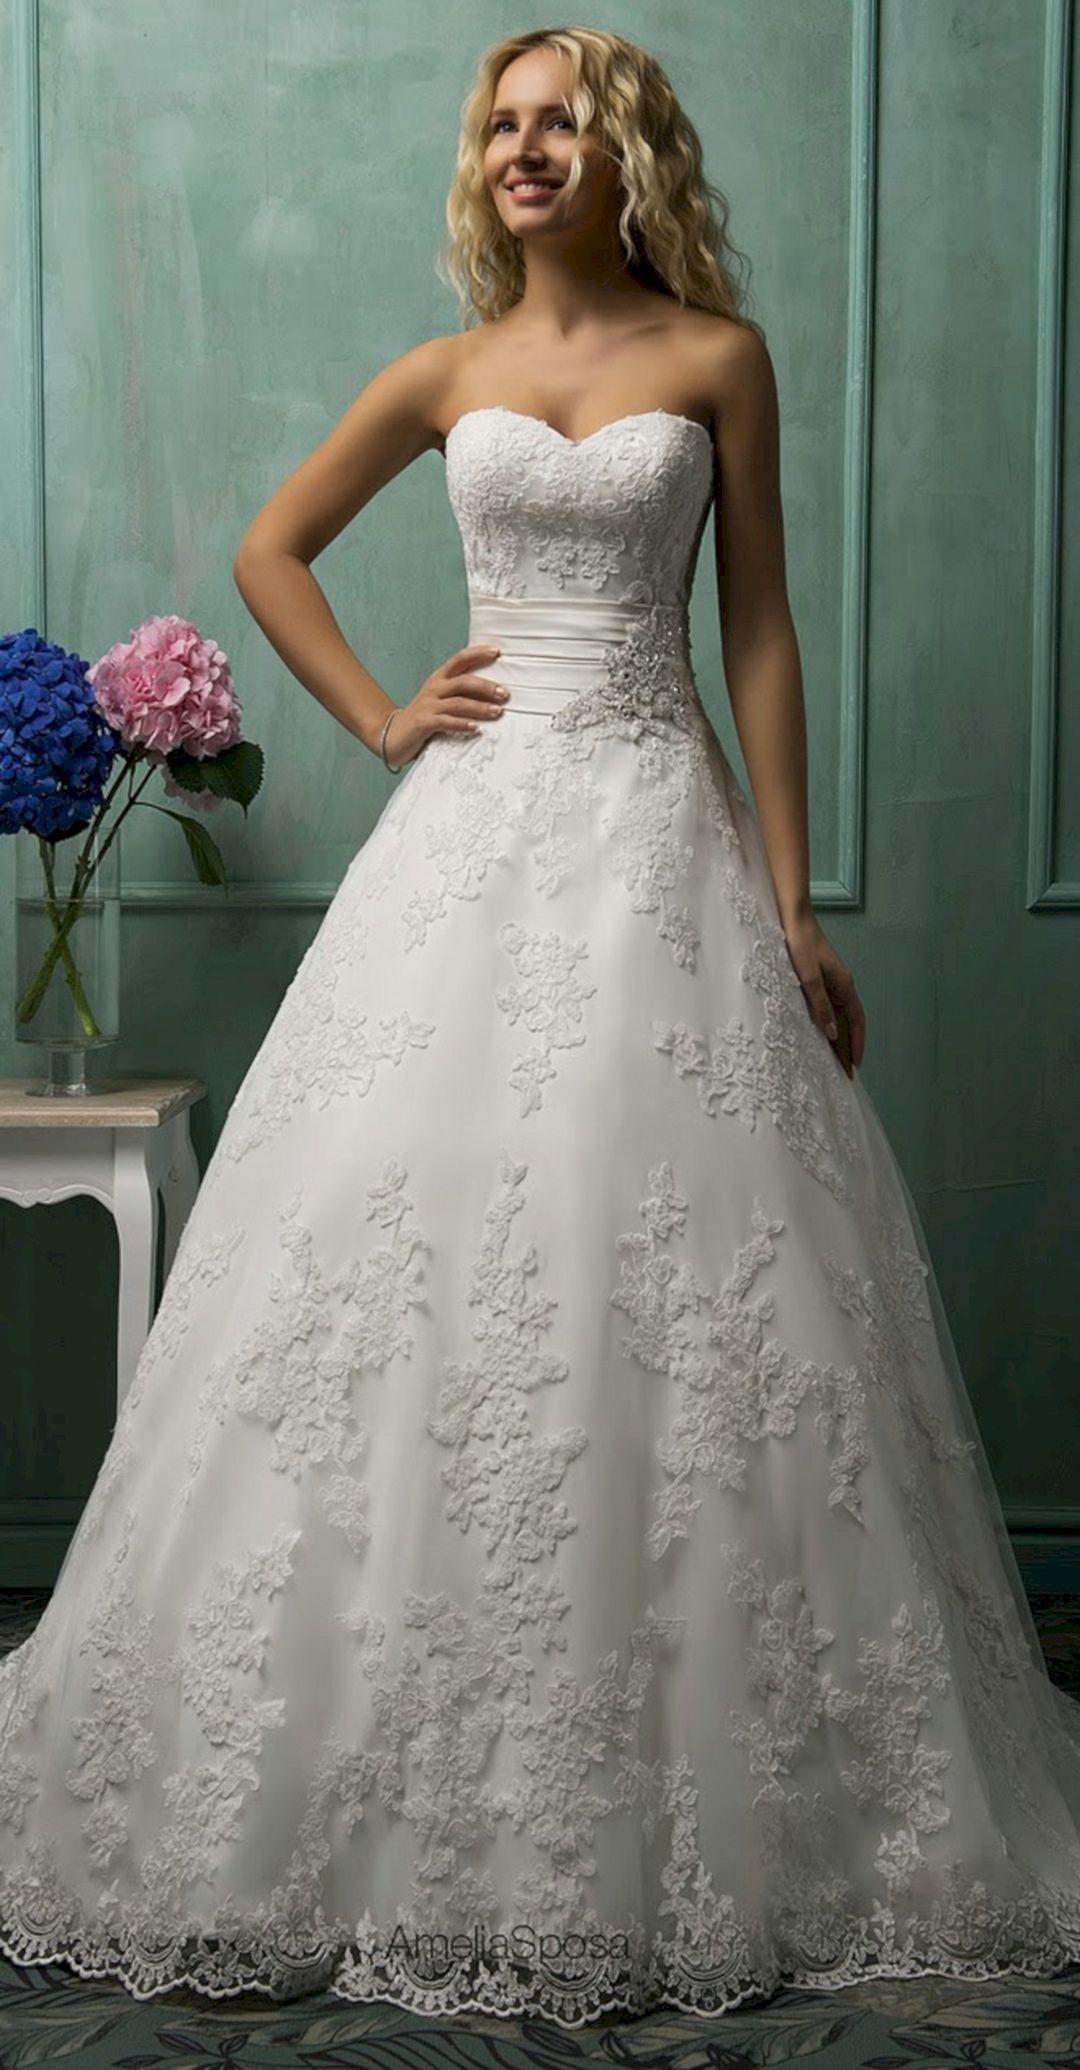 8 Exclusive Amelia Sposa Wedding Dress Collections Amelia Sposa Wedding Dress Wedding Dresses Lace A Line Wedding Dress